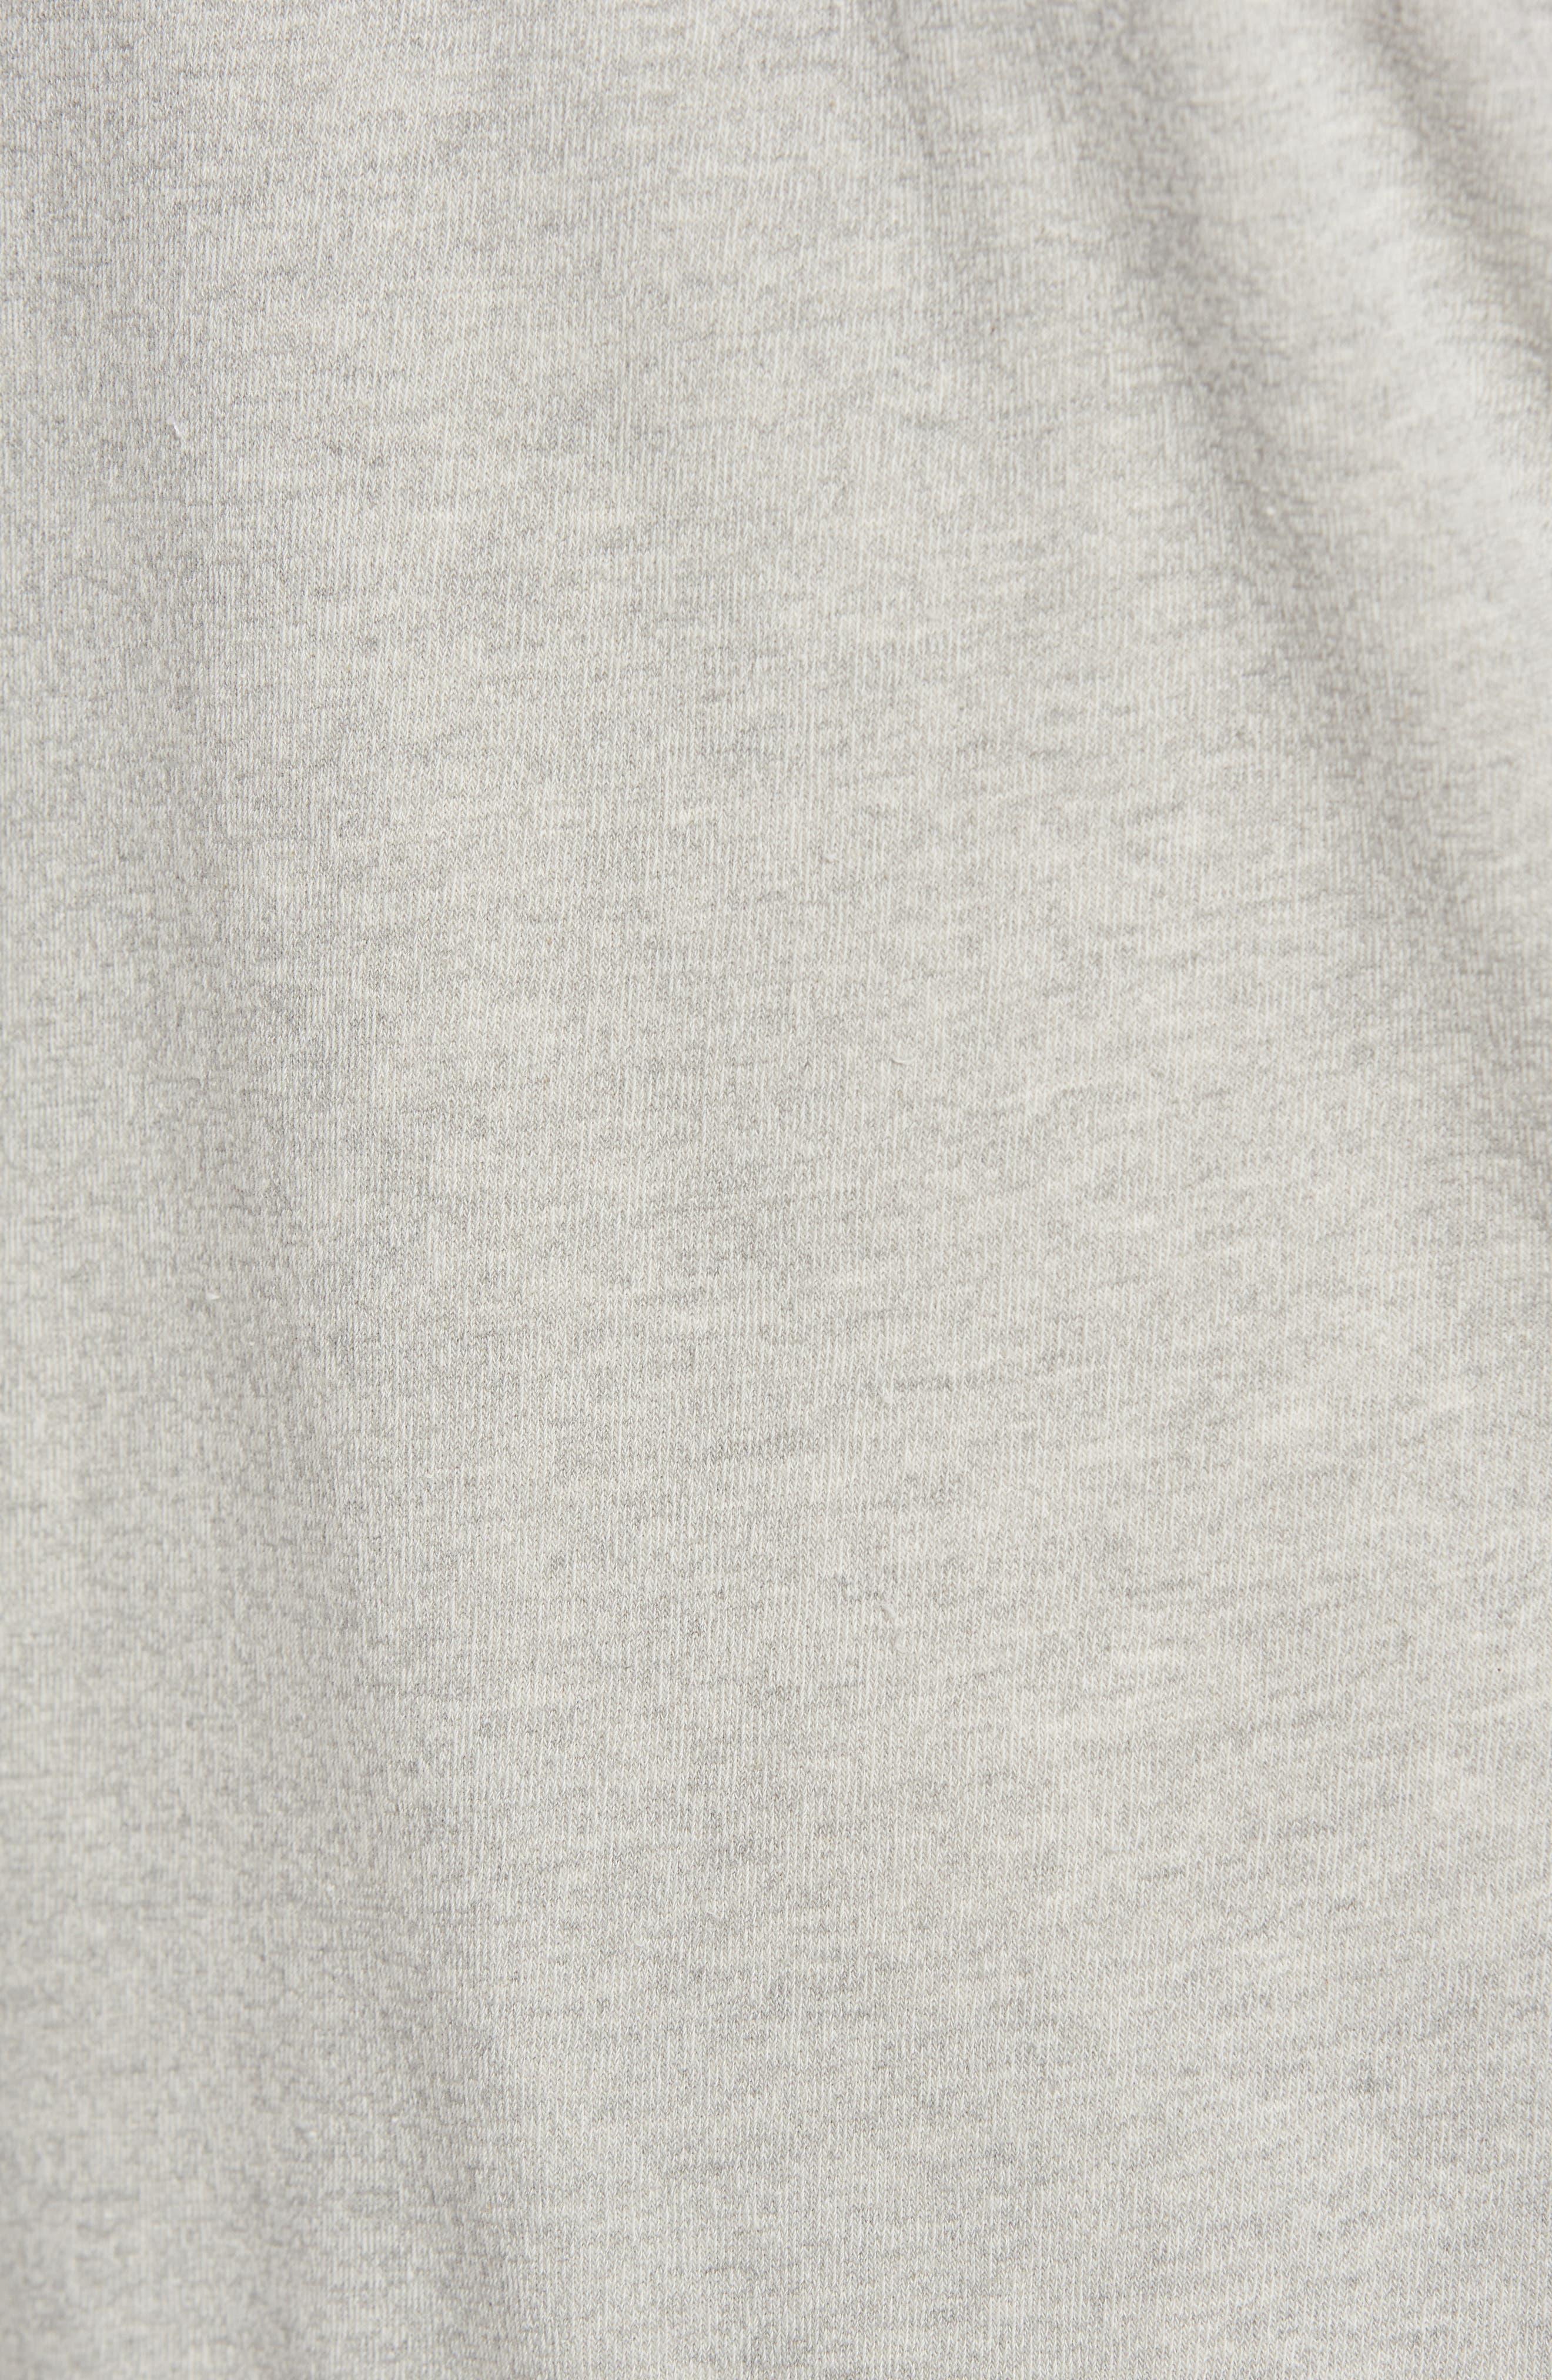 Off the Shoulder Sweatshirt,                             Alternate thumbnail 5, color,                             031